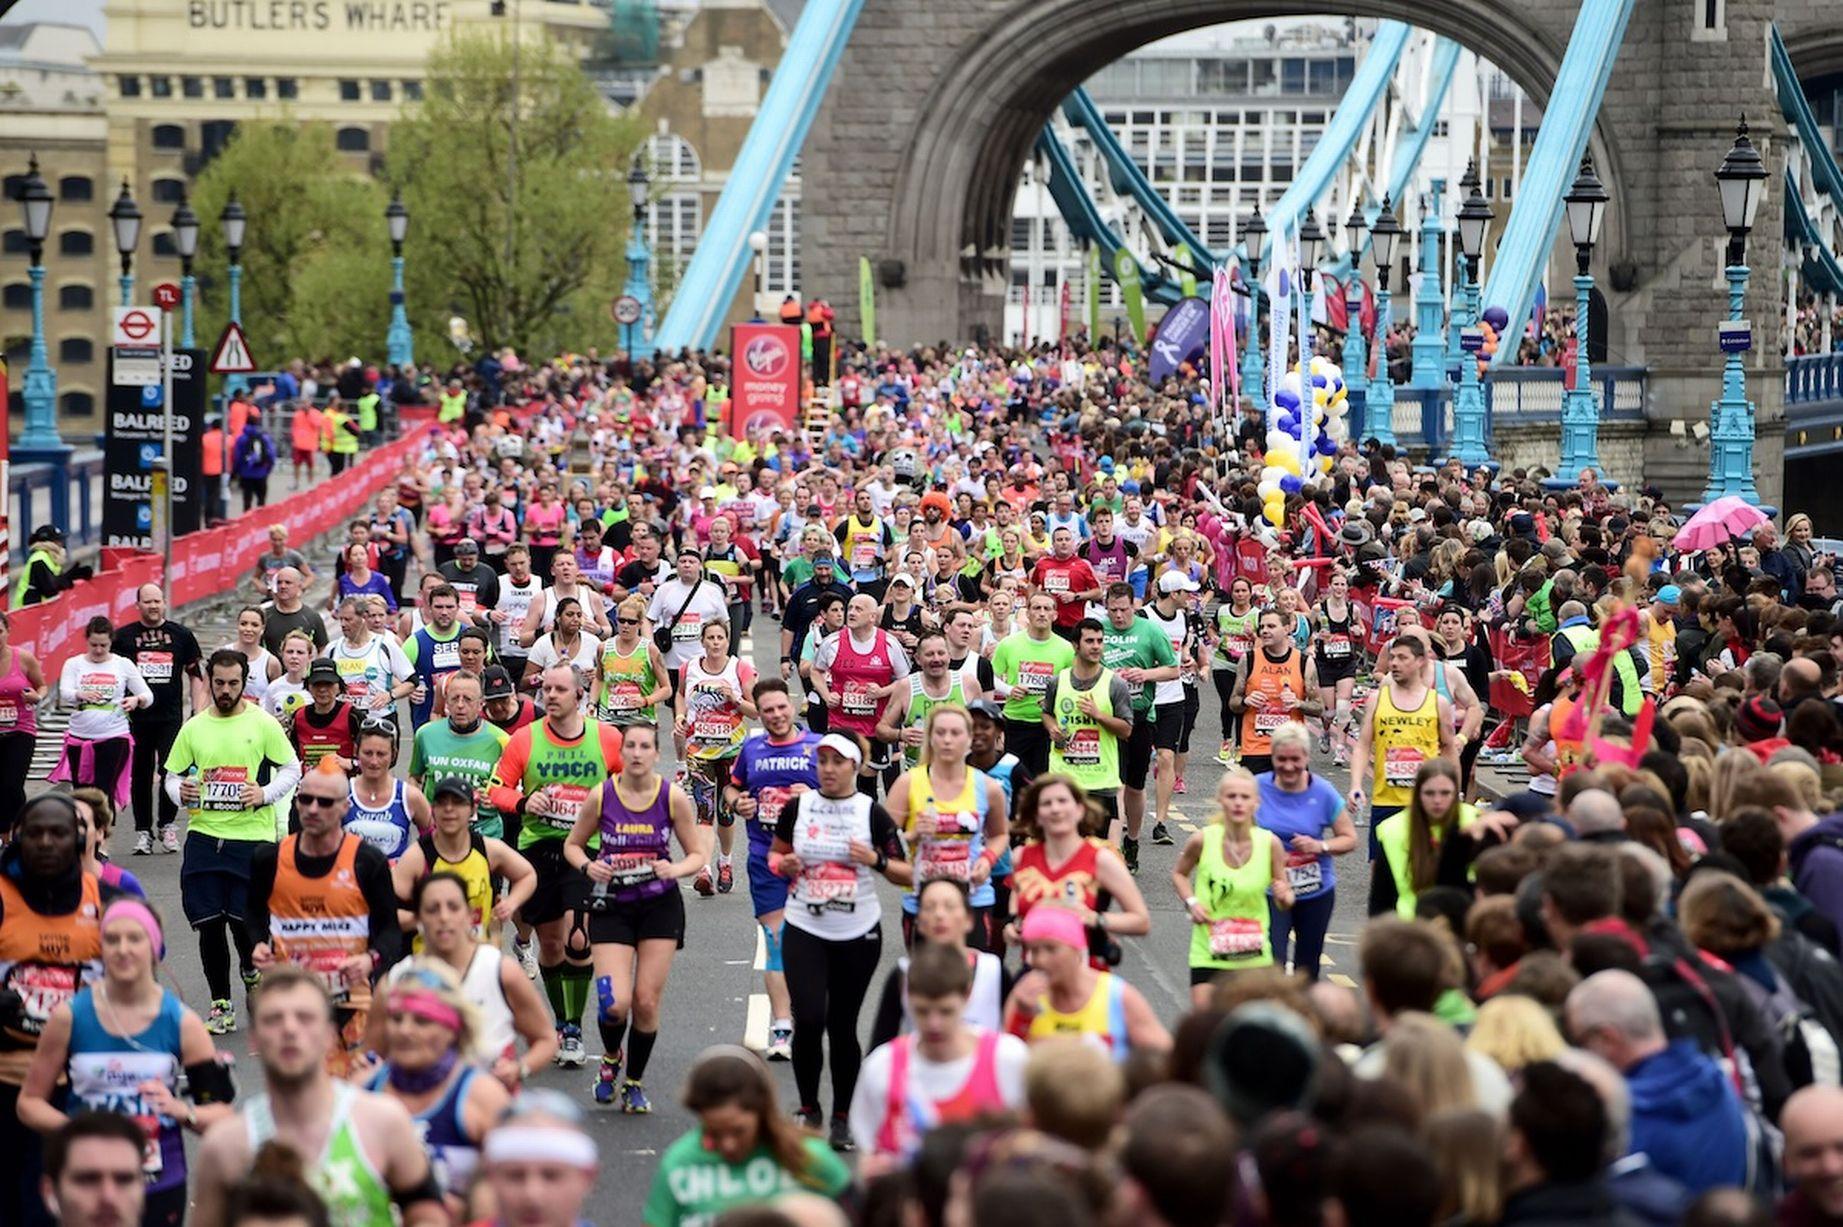 London Marathon event director Hugh Brasher